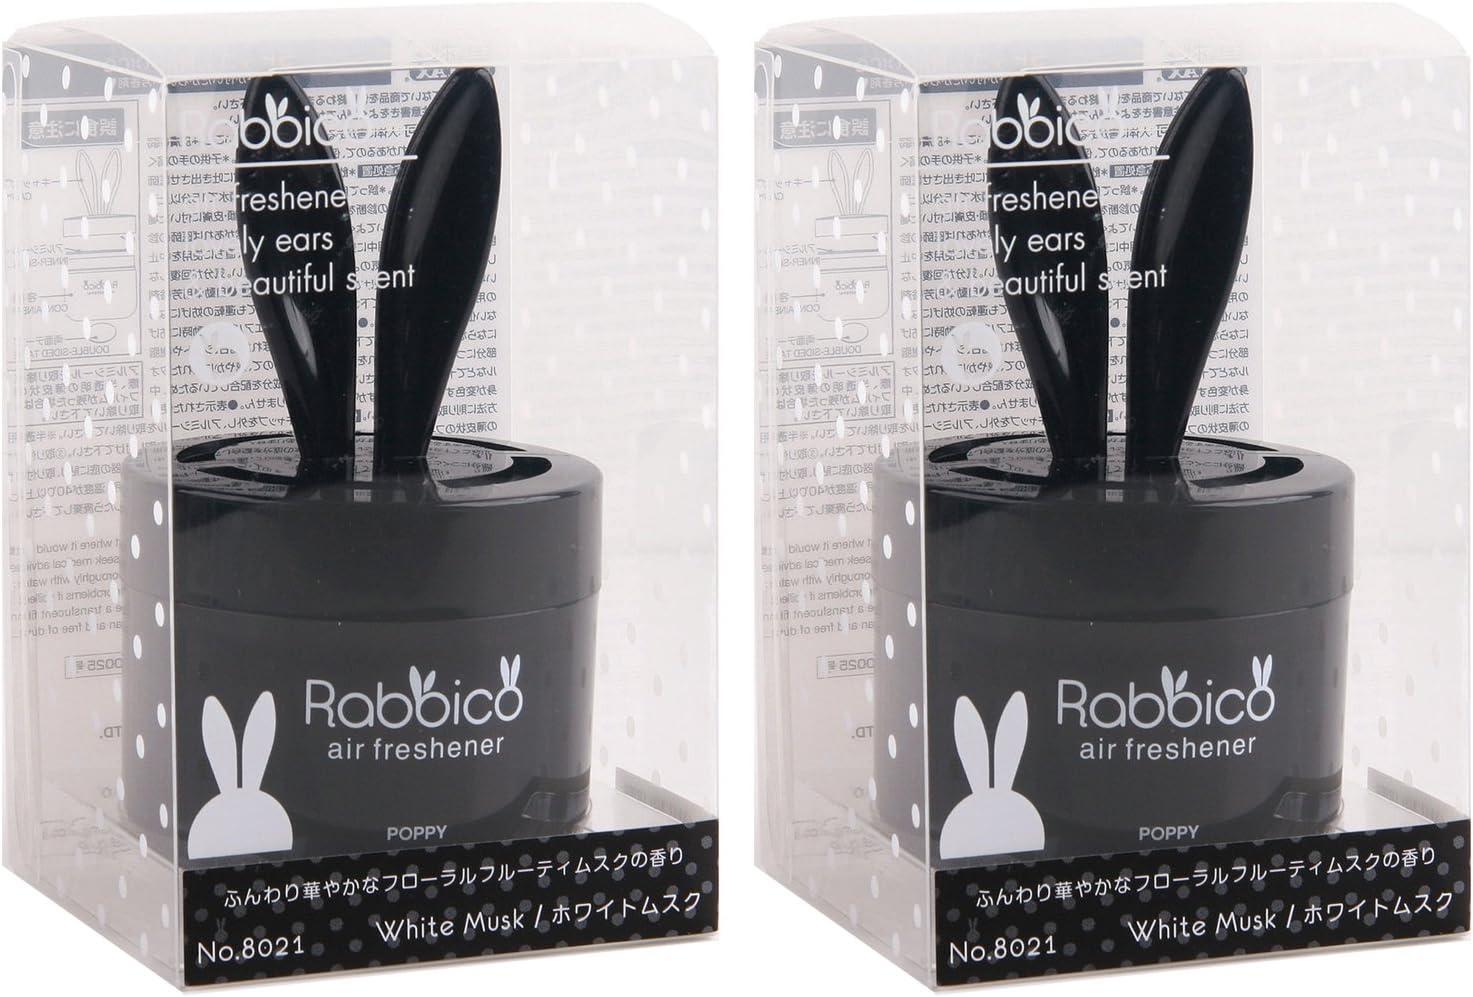 Diax RABBICO Poppy Rabbit Car/Home Air Freshener Japan 2 Packs White Musk Scent - Black